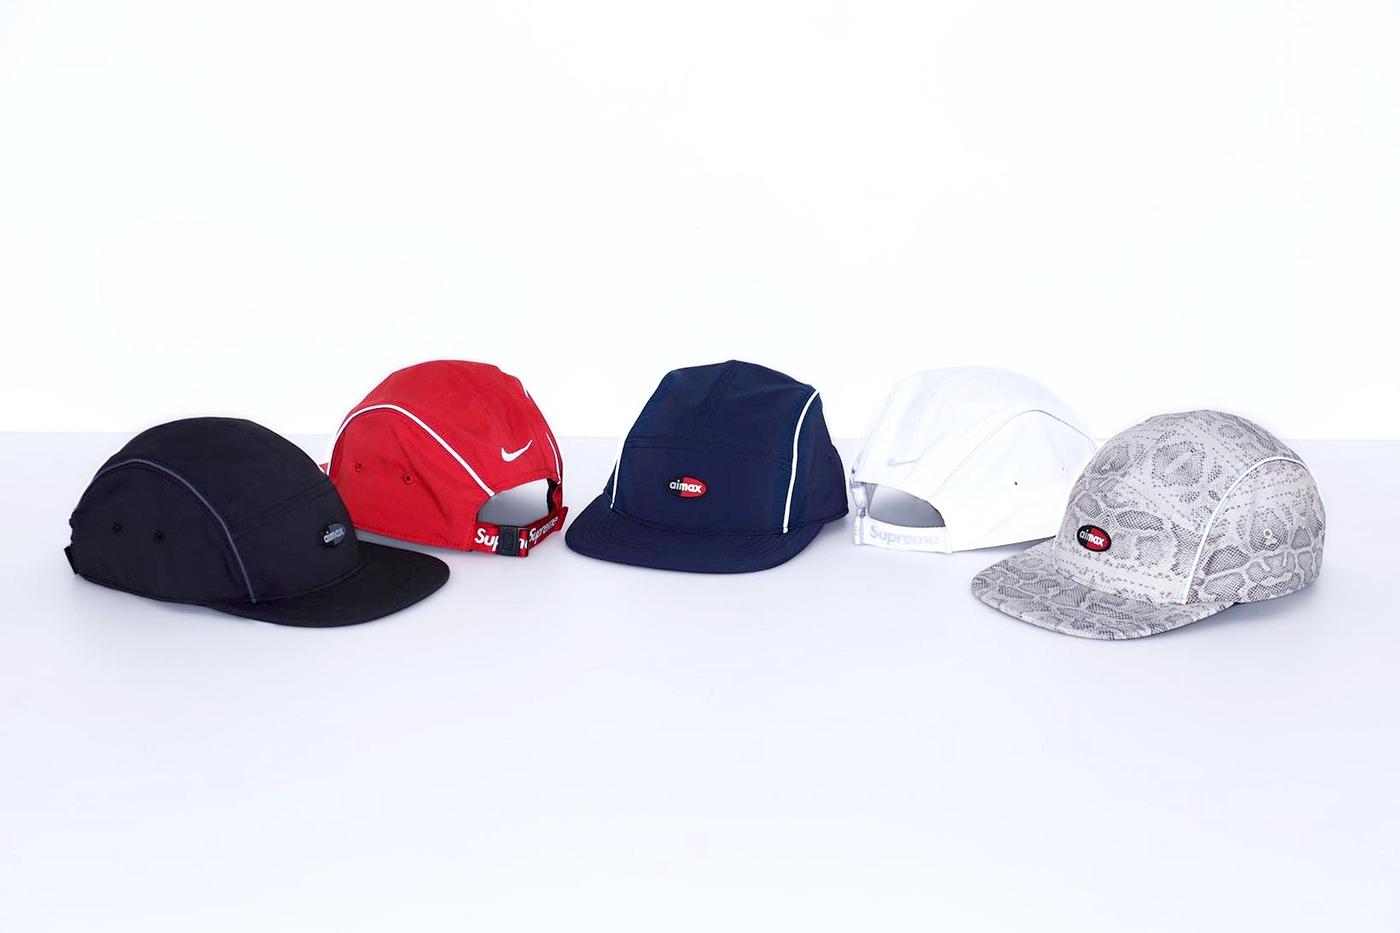 Nike x Supreme Cap 2016